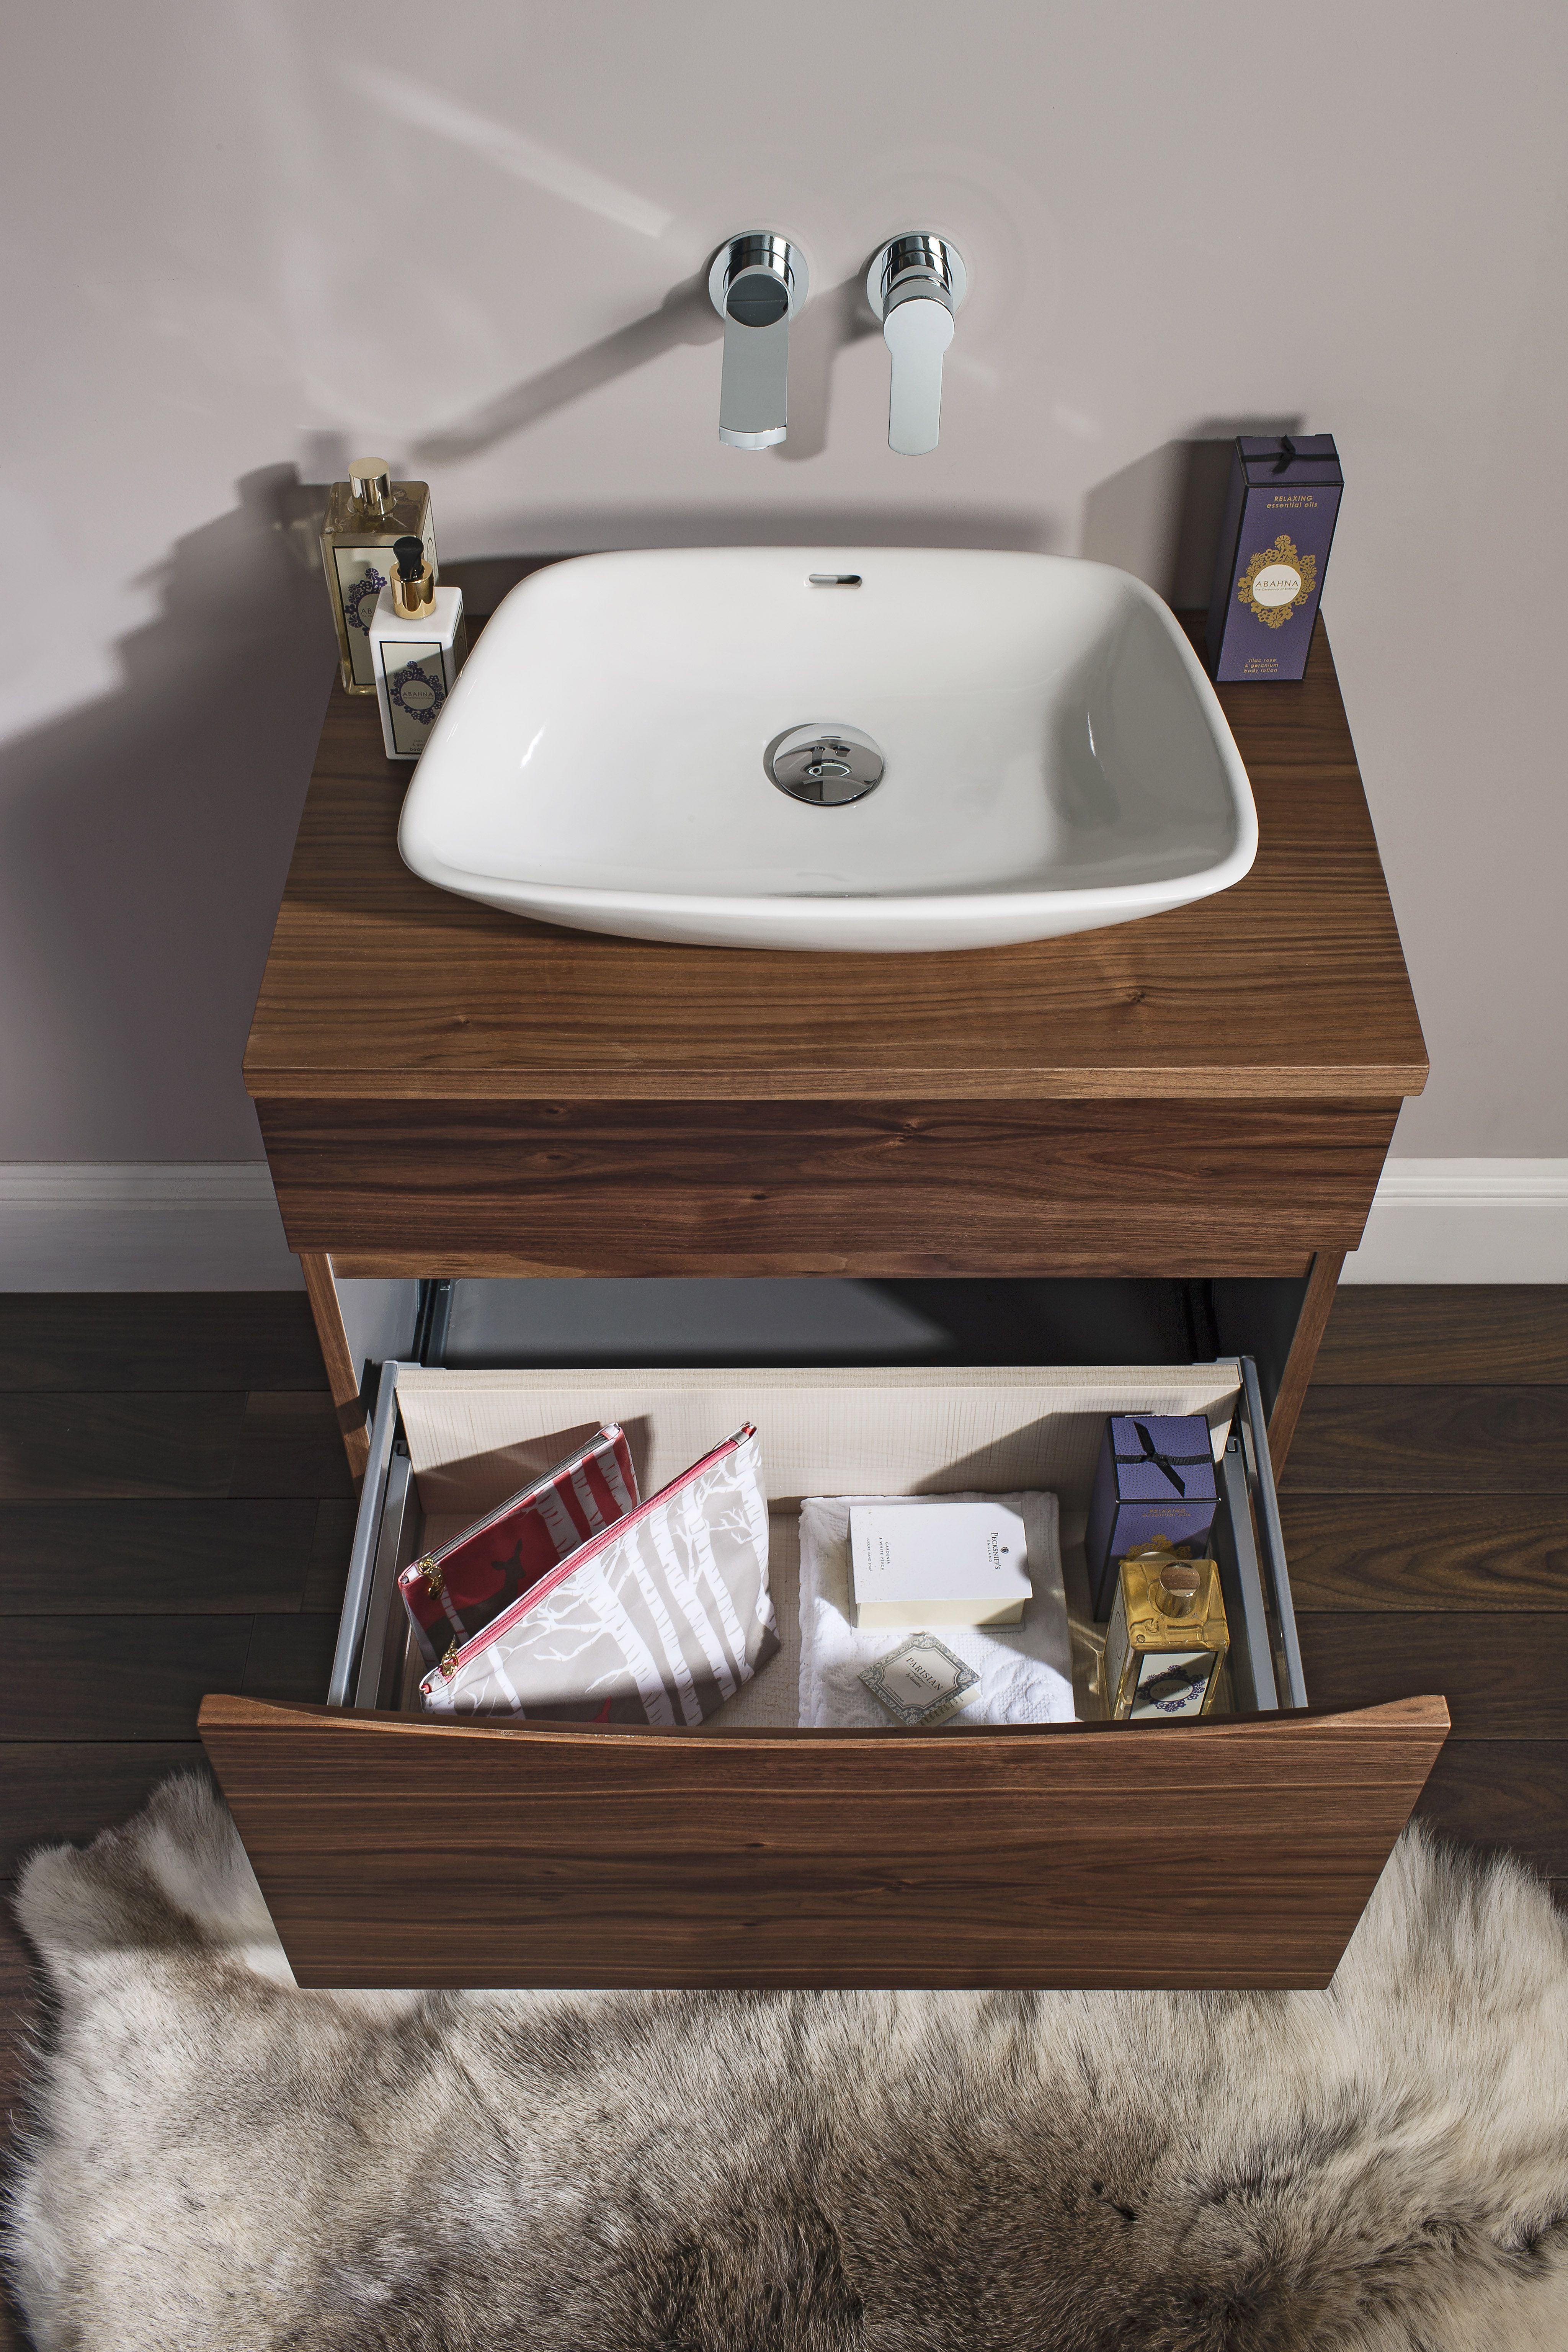 Glide Ii Bathroom Furniture Unit From Crosswater Http Www Bauhaus Bathrooms Co Uk Product Glide Ii American Walnu Basin Bathroom Furniture